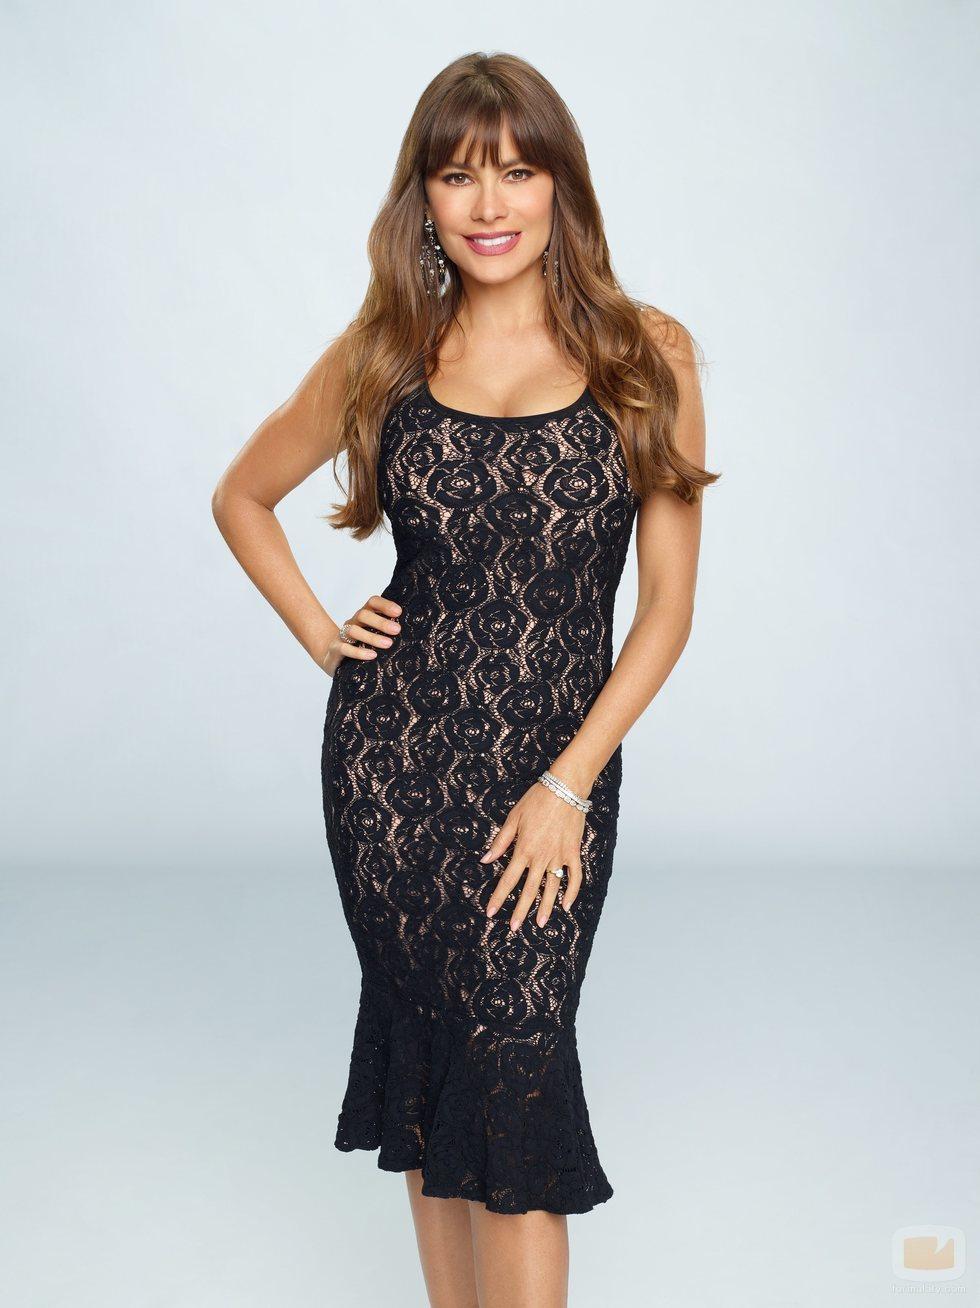 Sofía Vergara posa para la décima temporada de 'Modern Family'